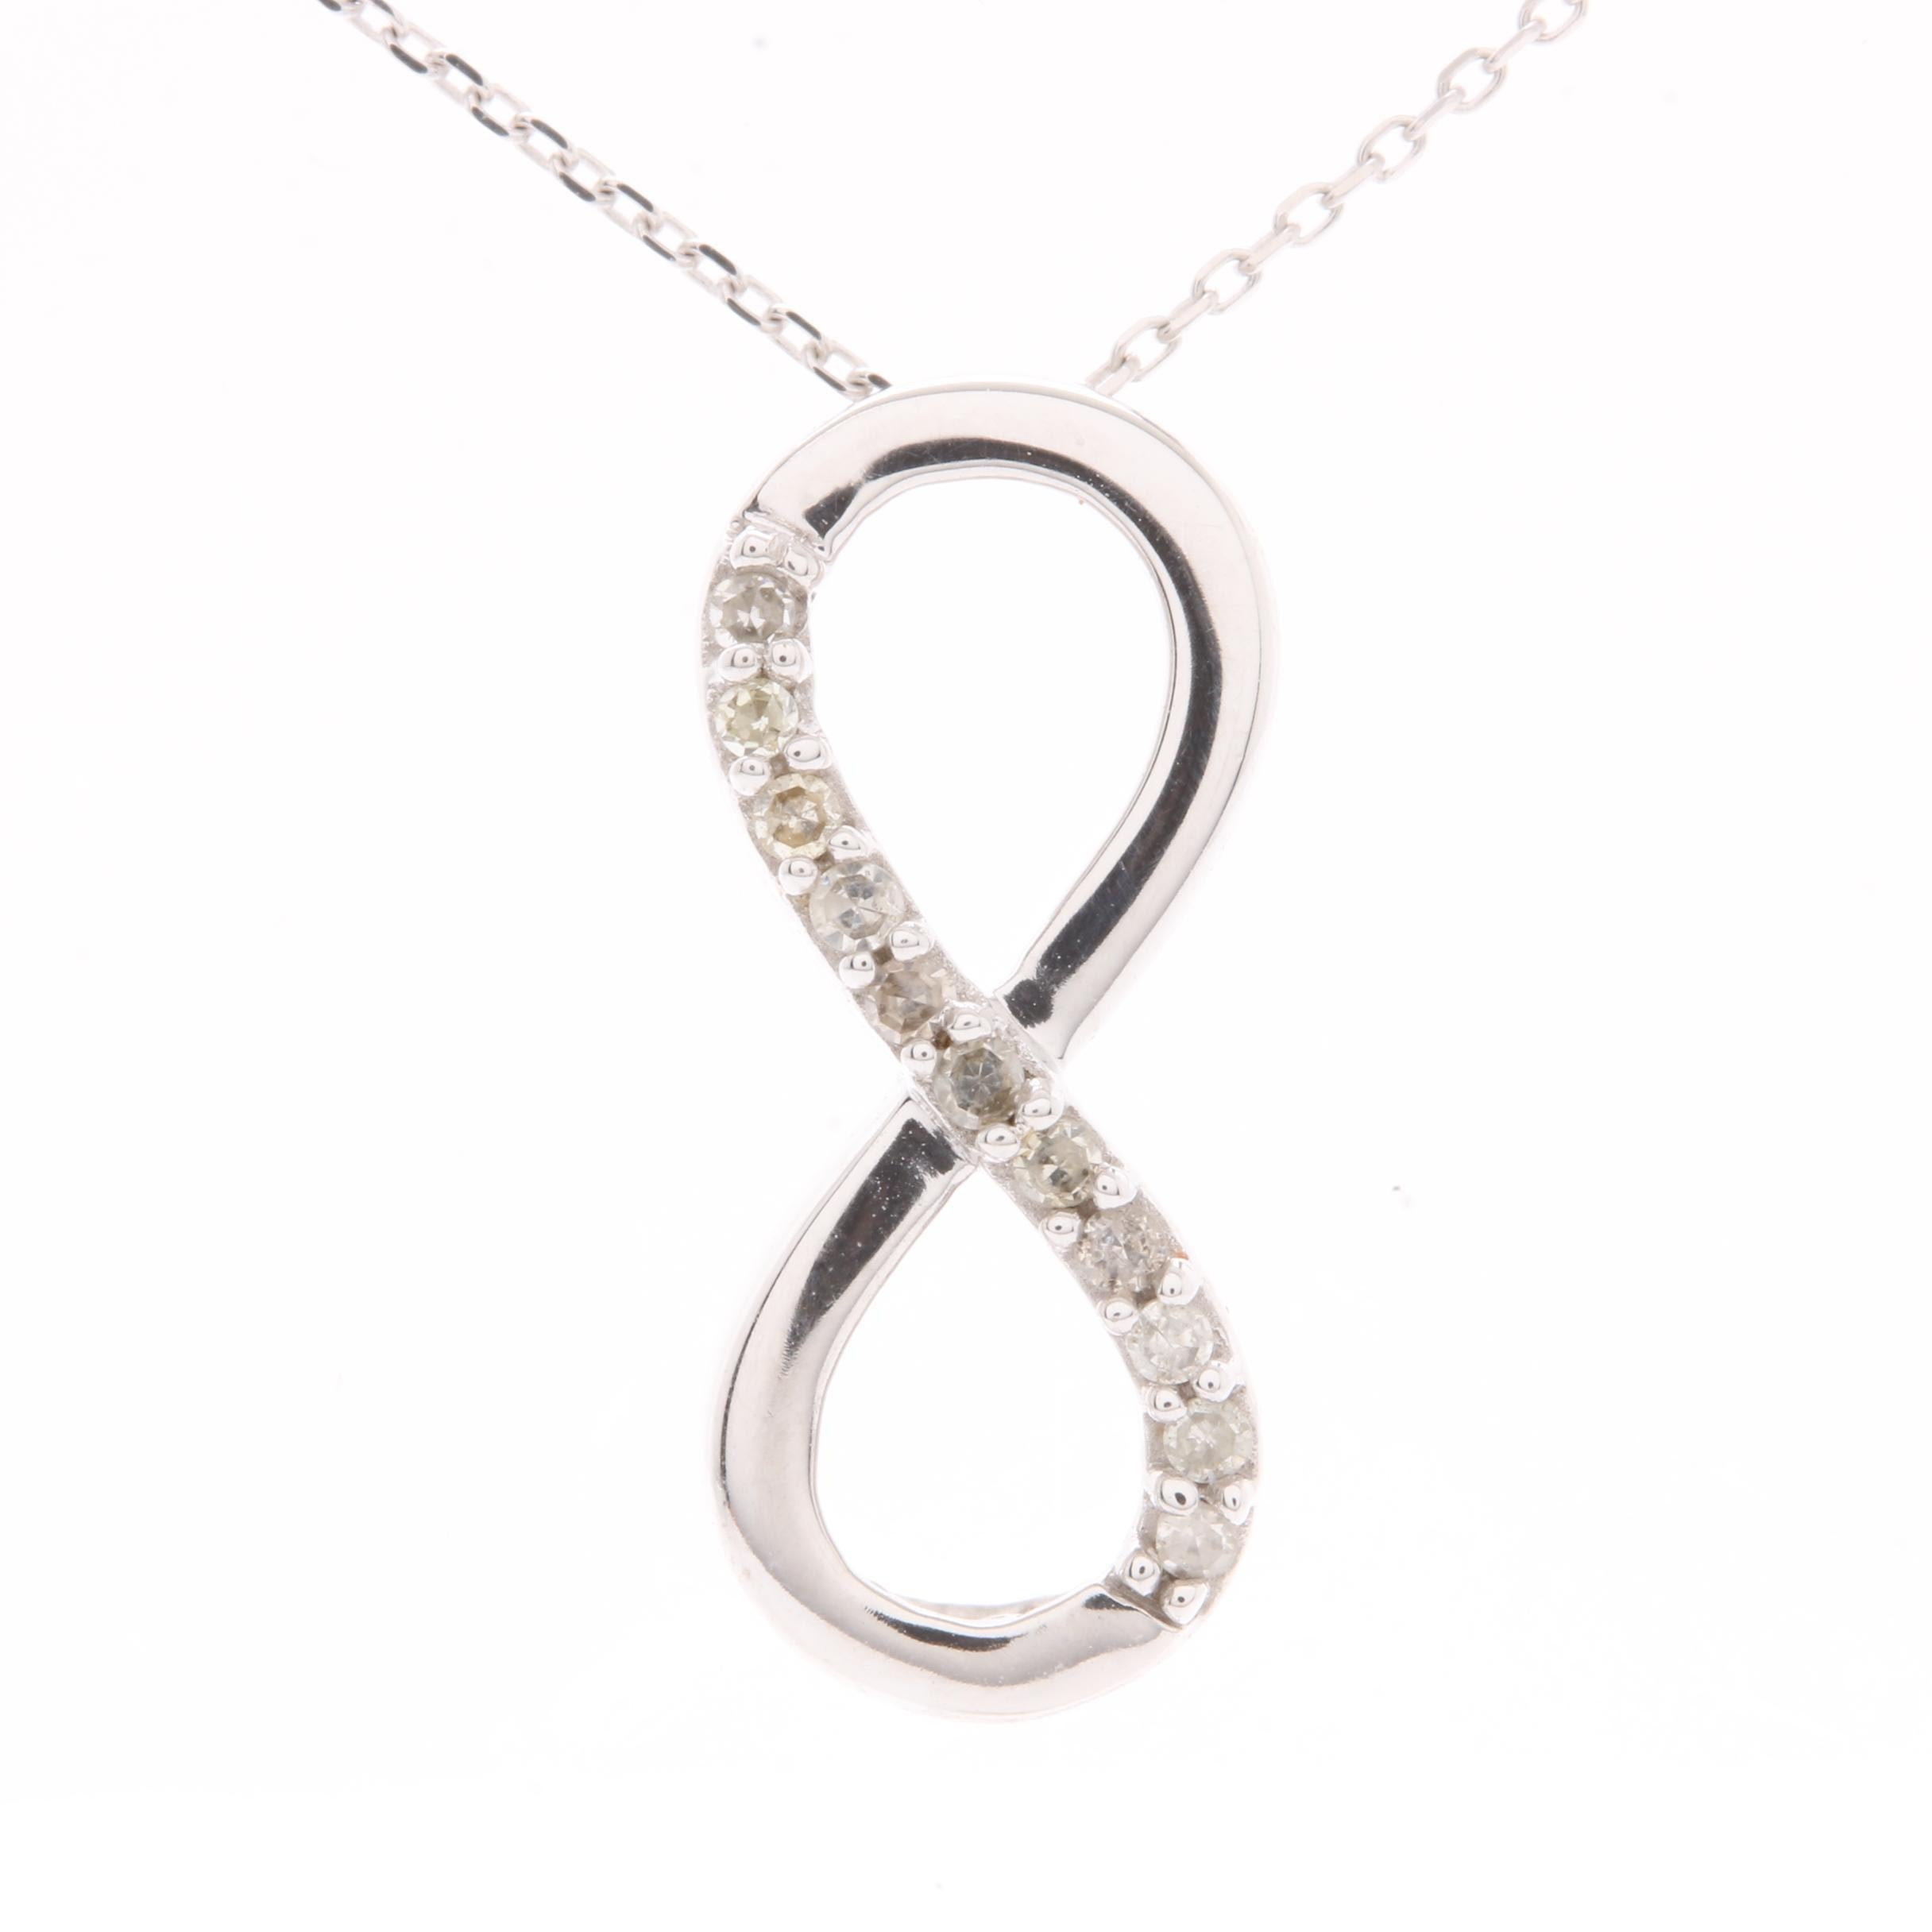 10K White Gold Diamond Infinity Necklace